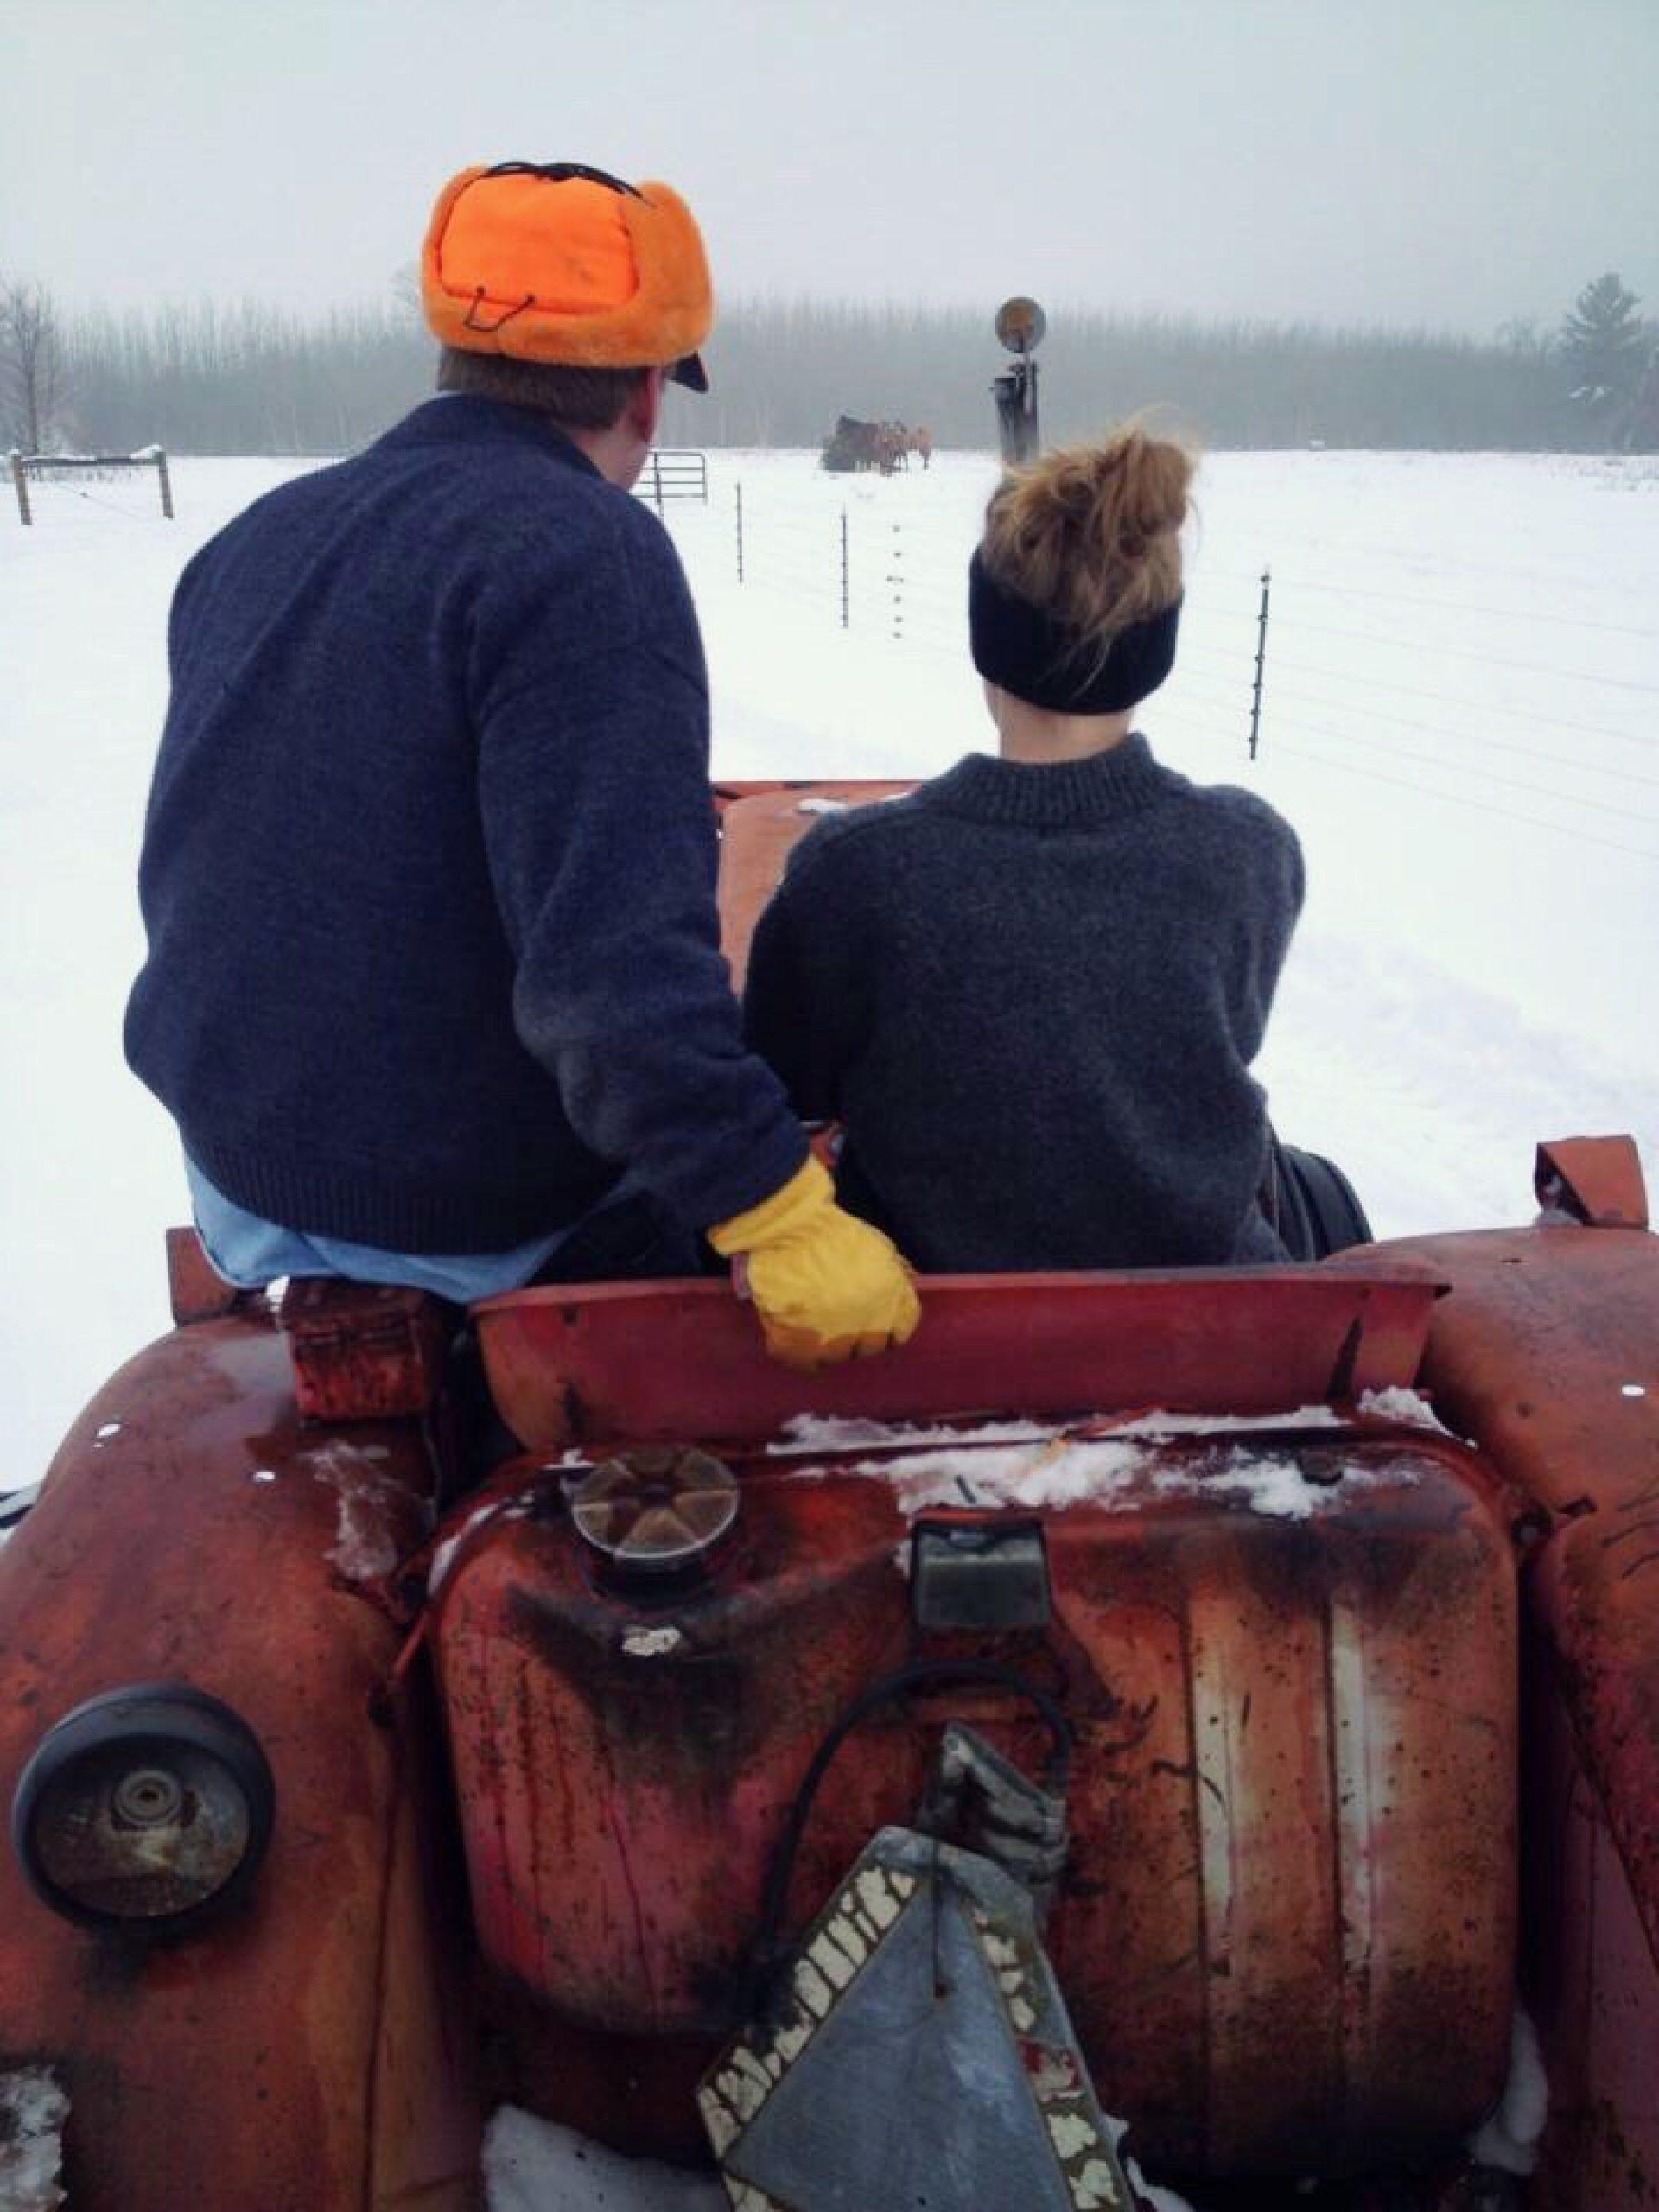 Molly Tractor Farm